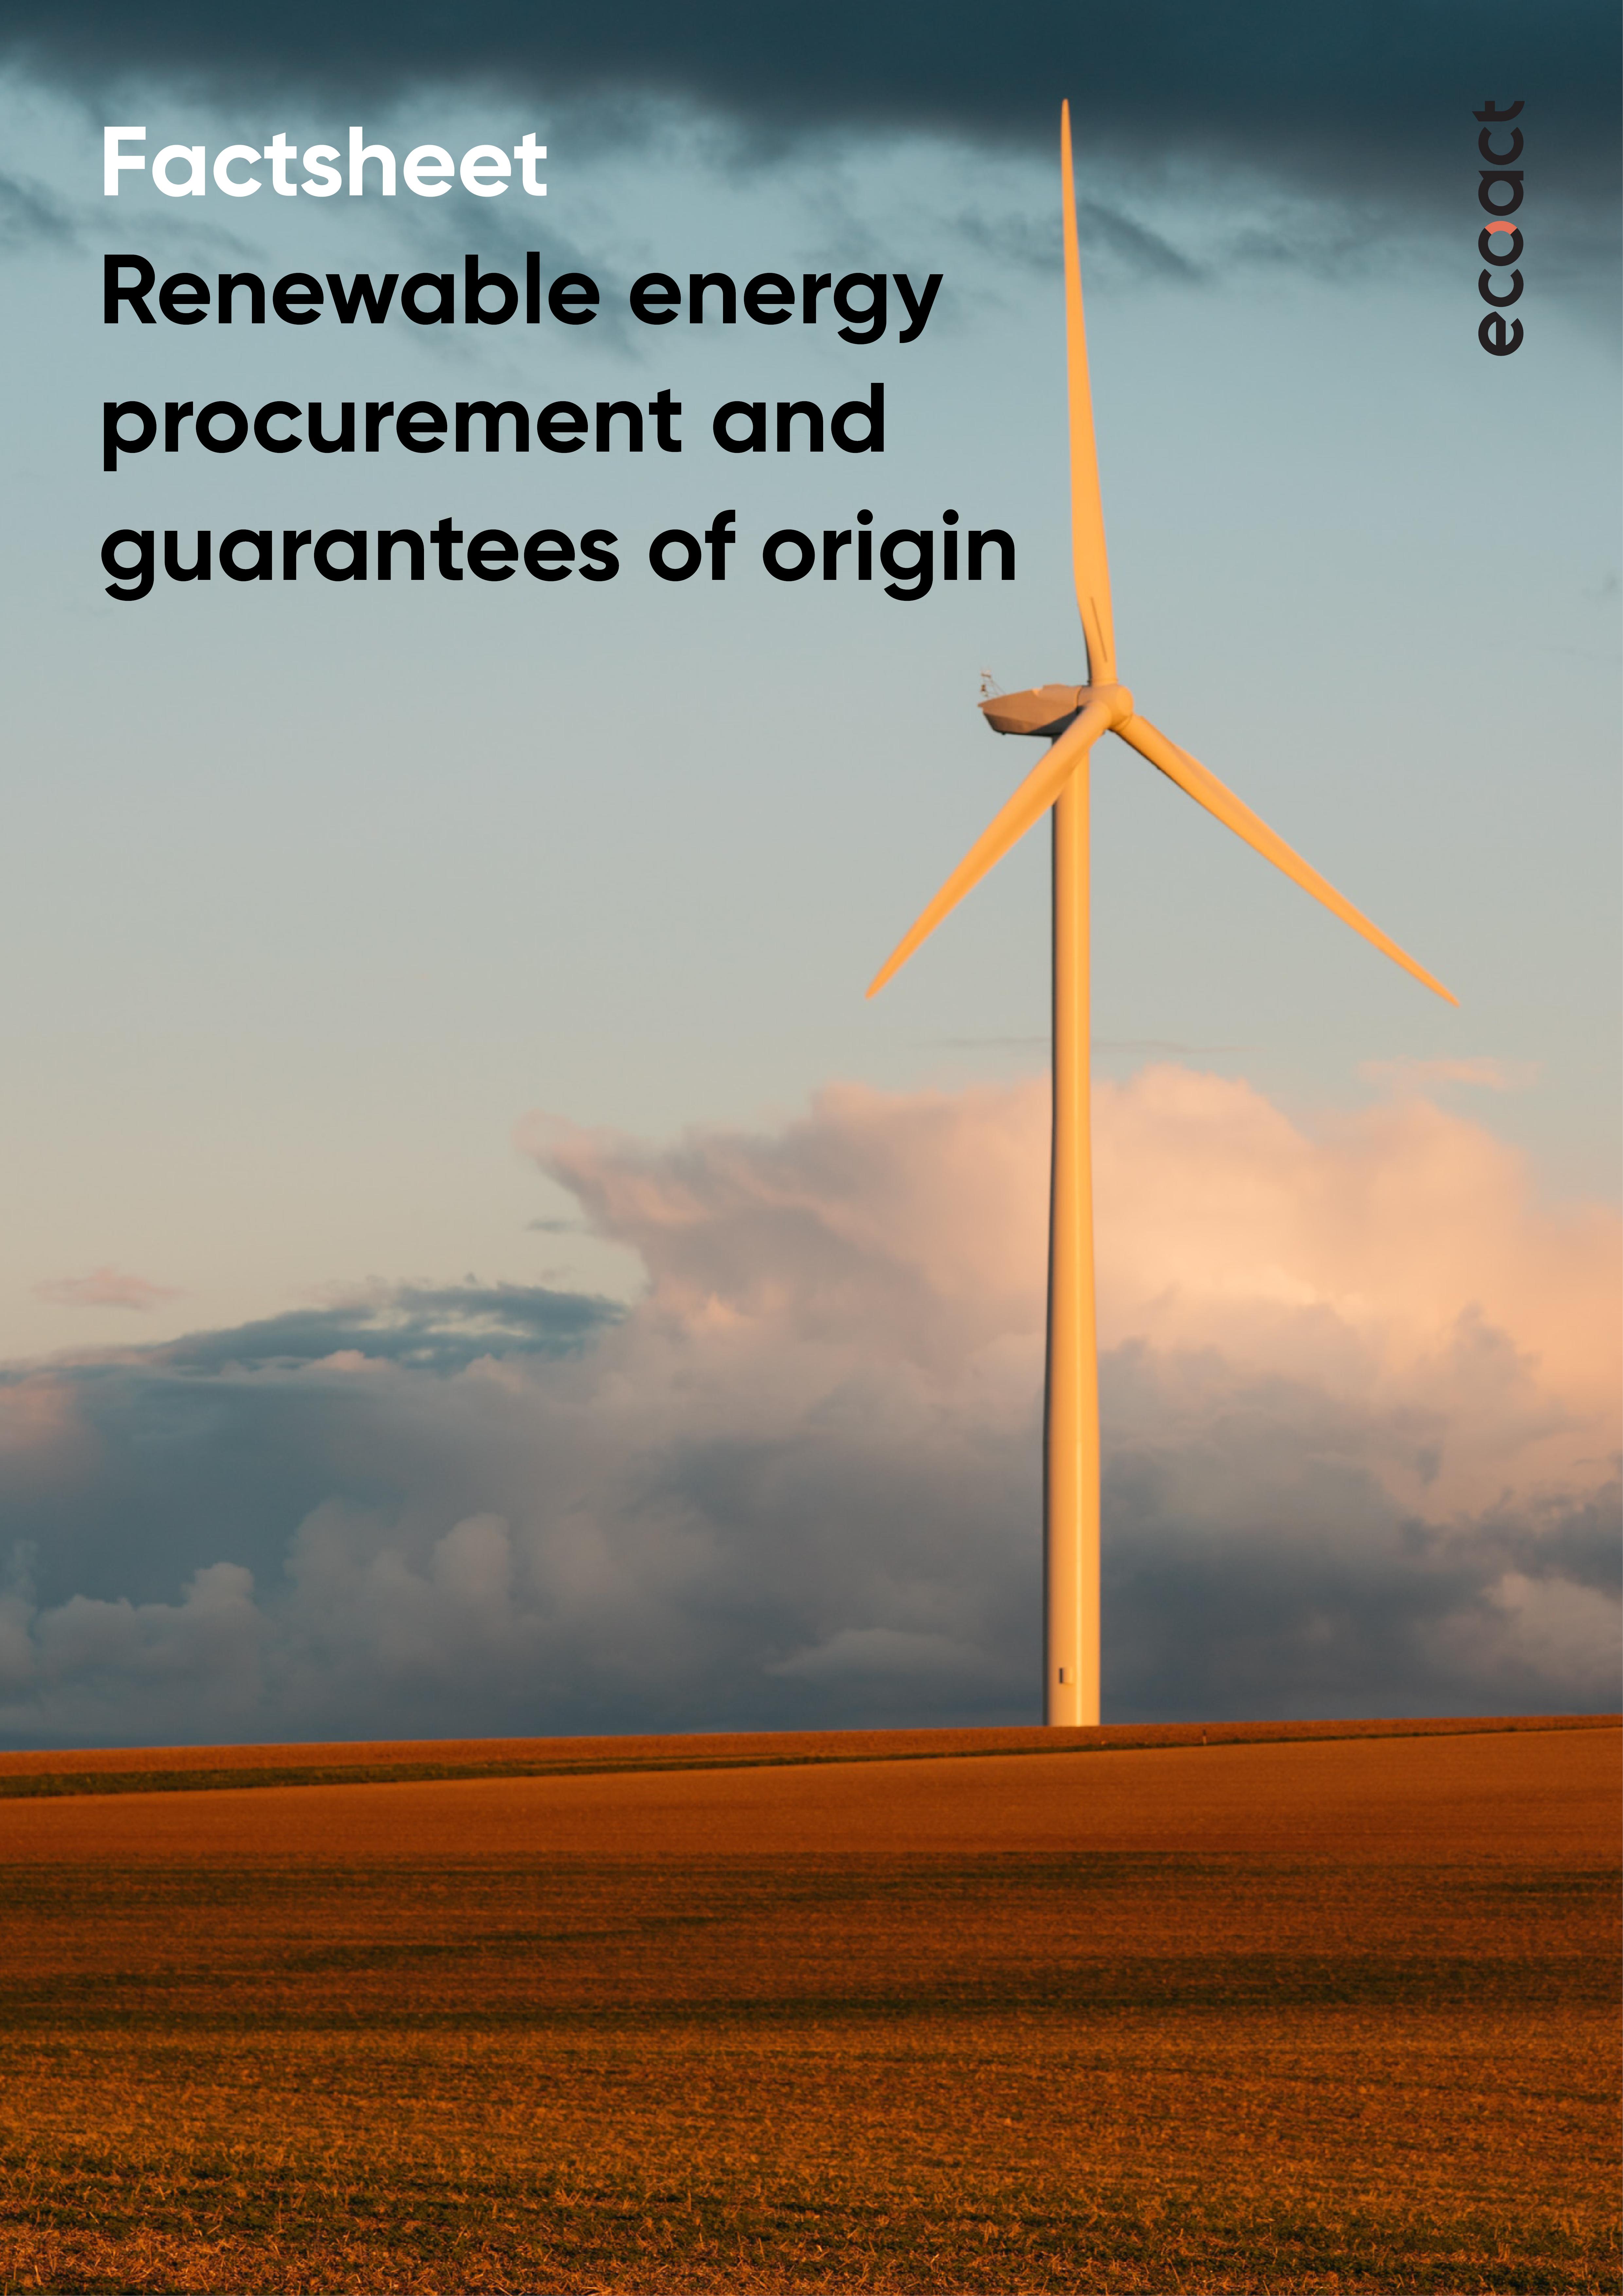 Renewable energy procurement and GOs - image